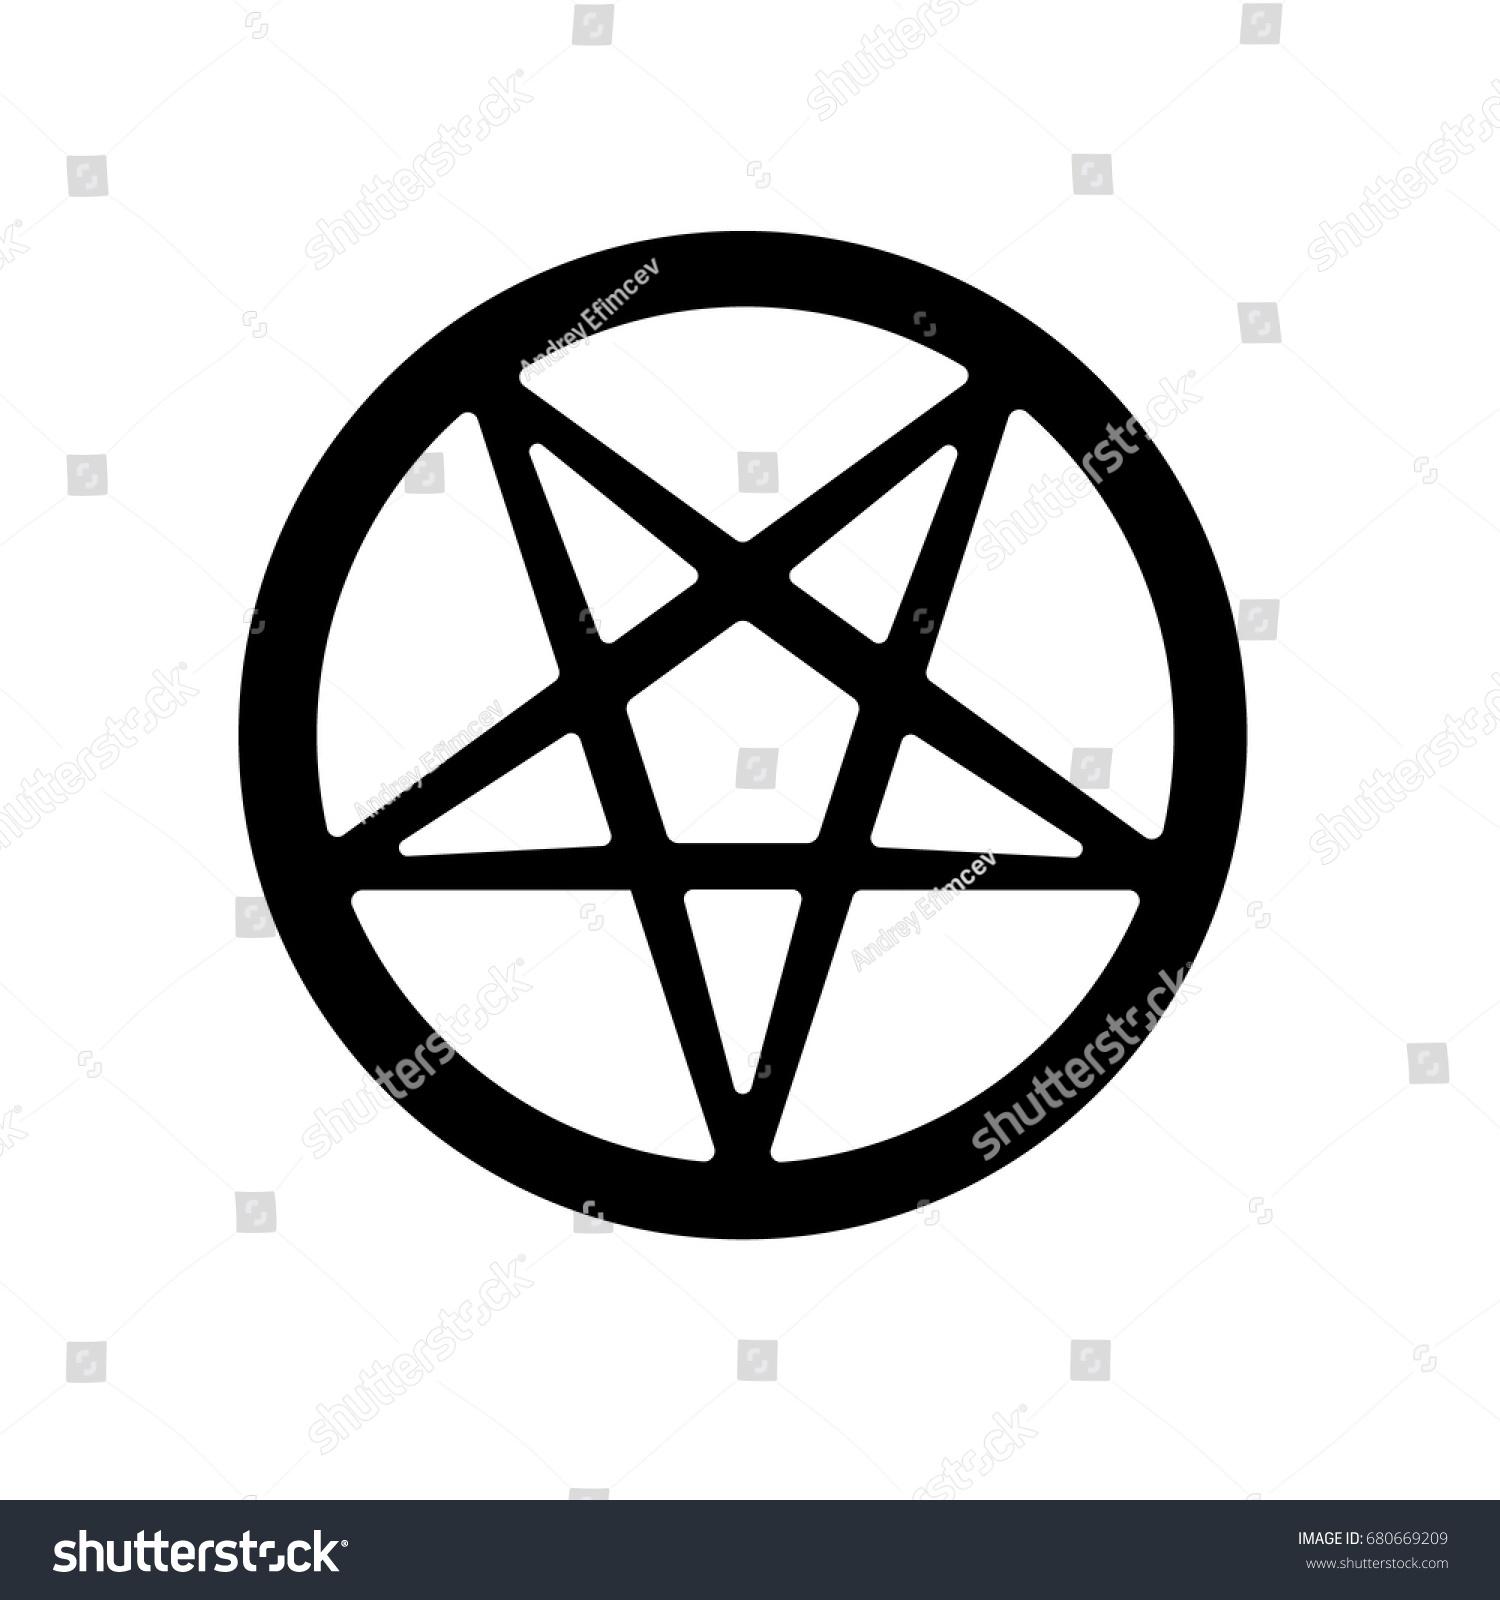 Satanic pentagram symbol icon vector stock vector 680669209 satanic pentagram symbol icon vector biocorpaavc Choice Image